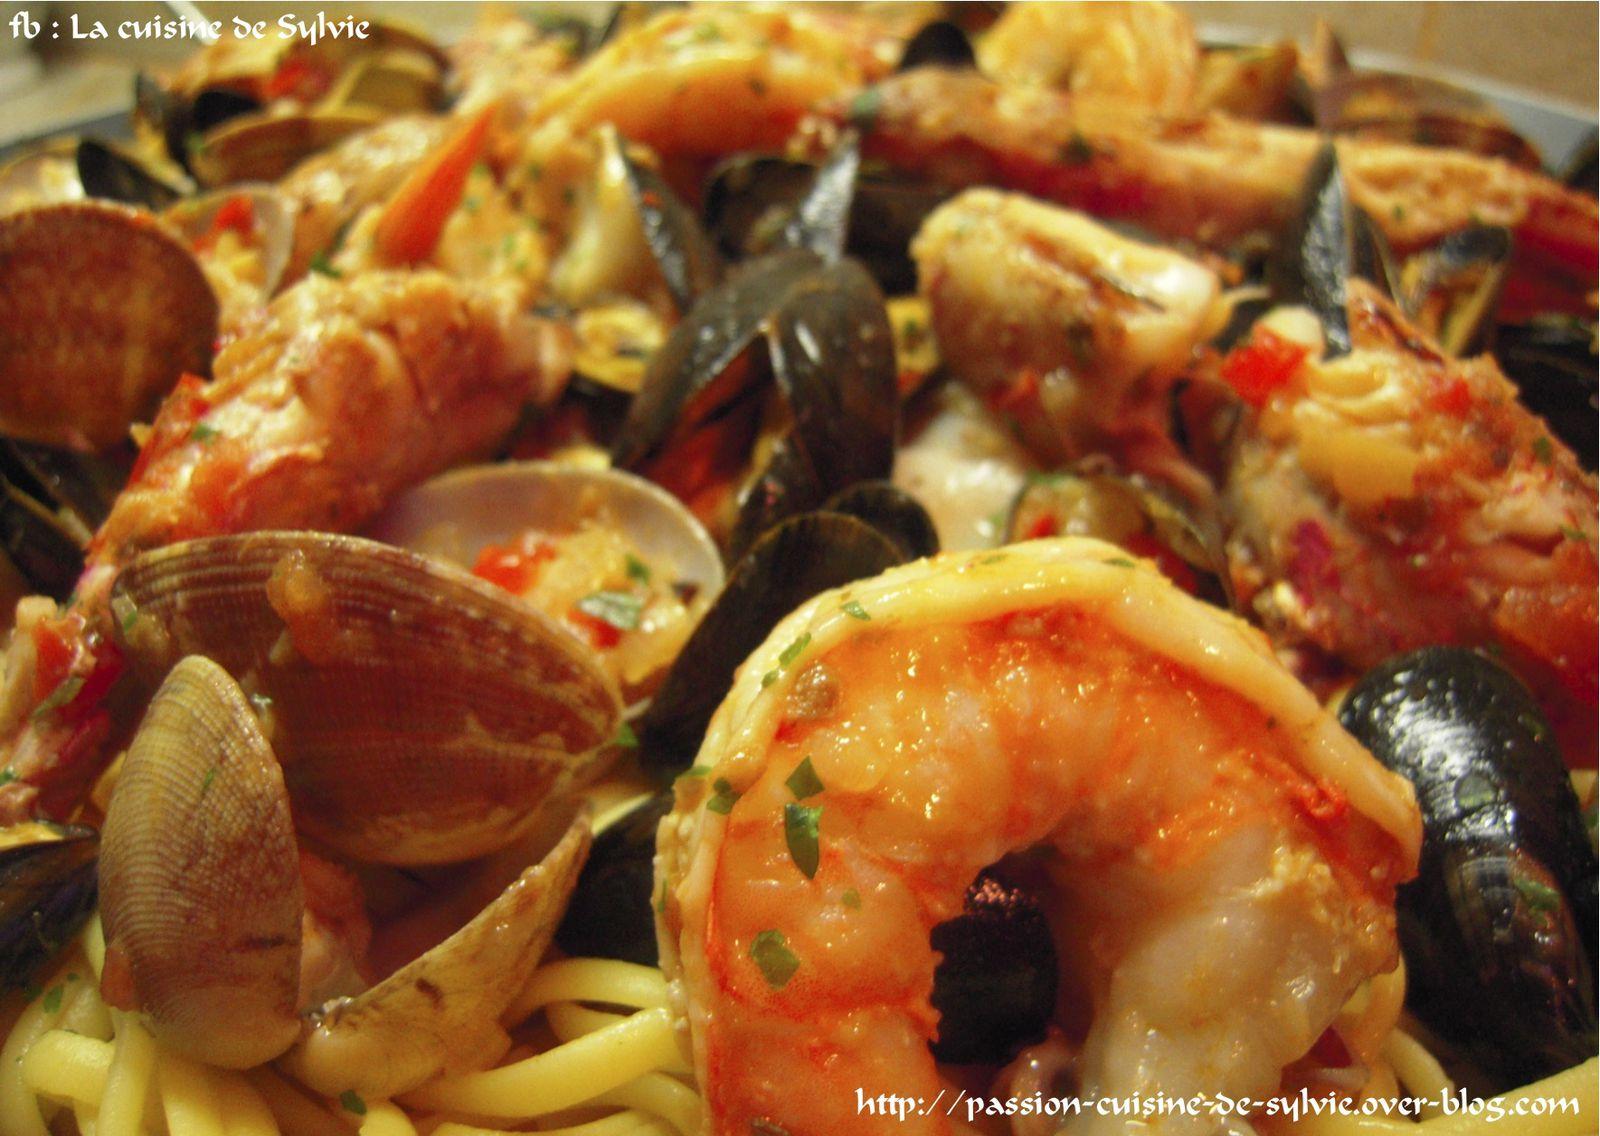 Pâtes de l'Amiral - Recette du Chef Bernard Coloma